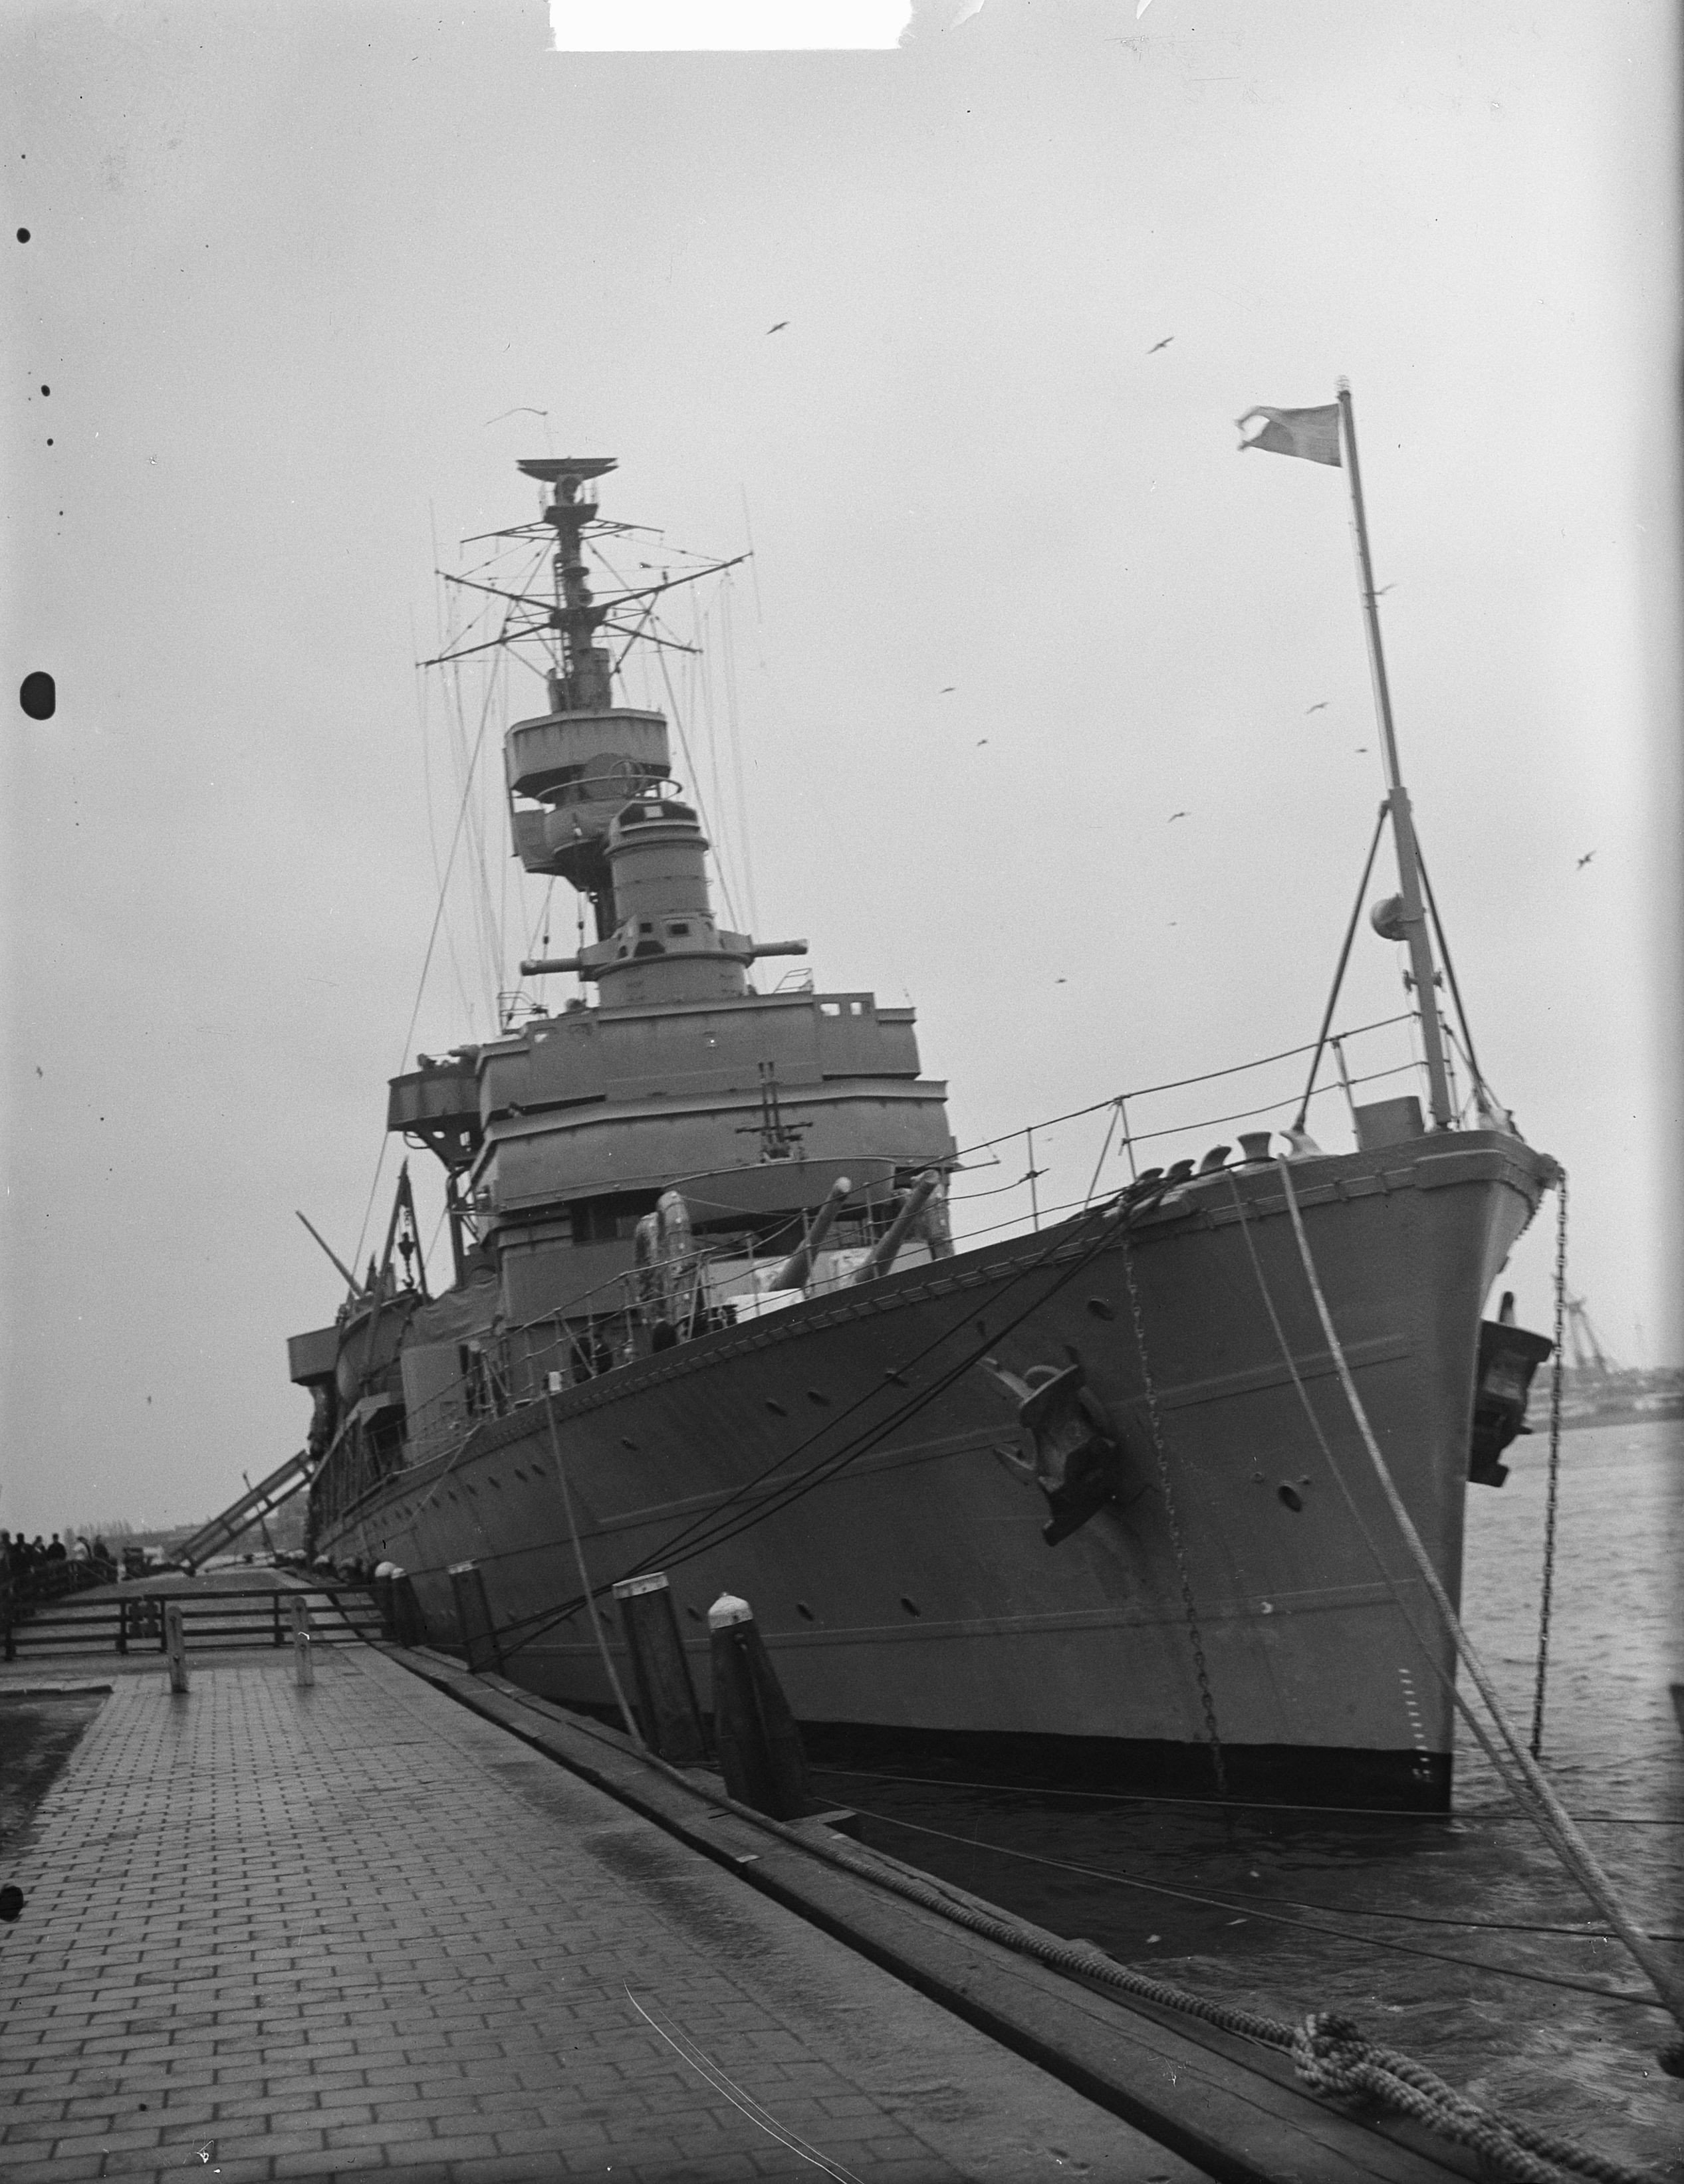 File:Zweedse kruiser Gotland in Tankhaven Rotterdam, Bestanddeelnr 903-2667 .jpg